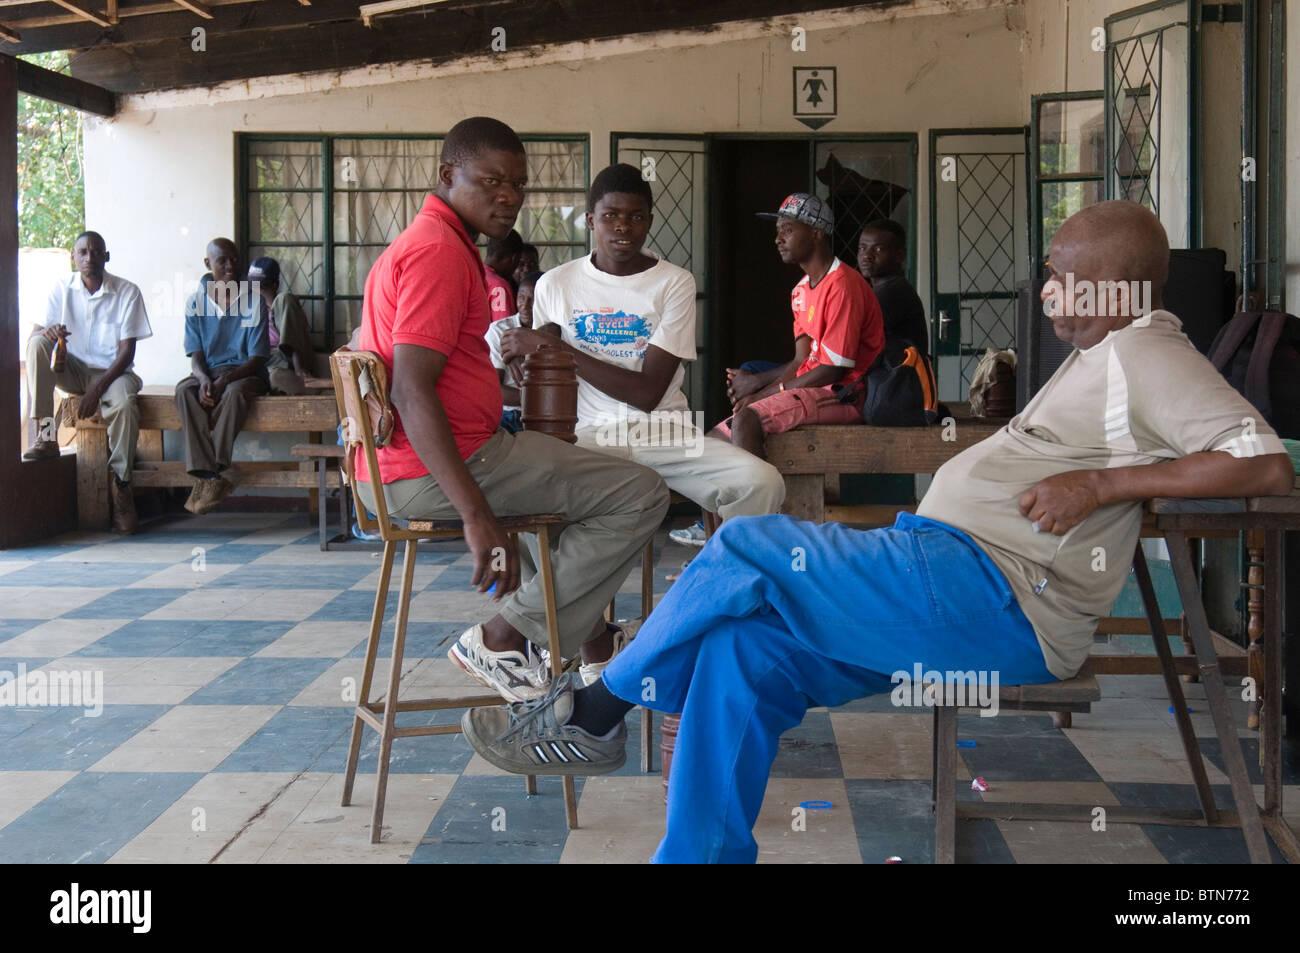 Patrons of the Falls Nightclub, a working man's bar in Victoria Falls, Zimbabwe - Stock Image